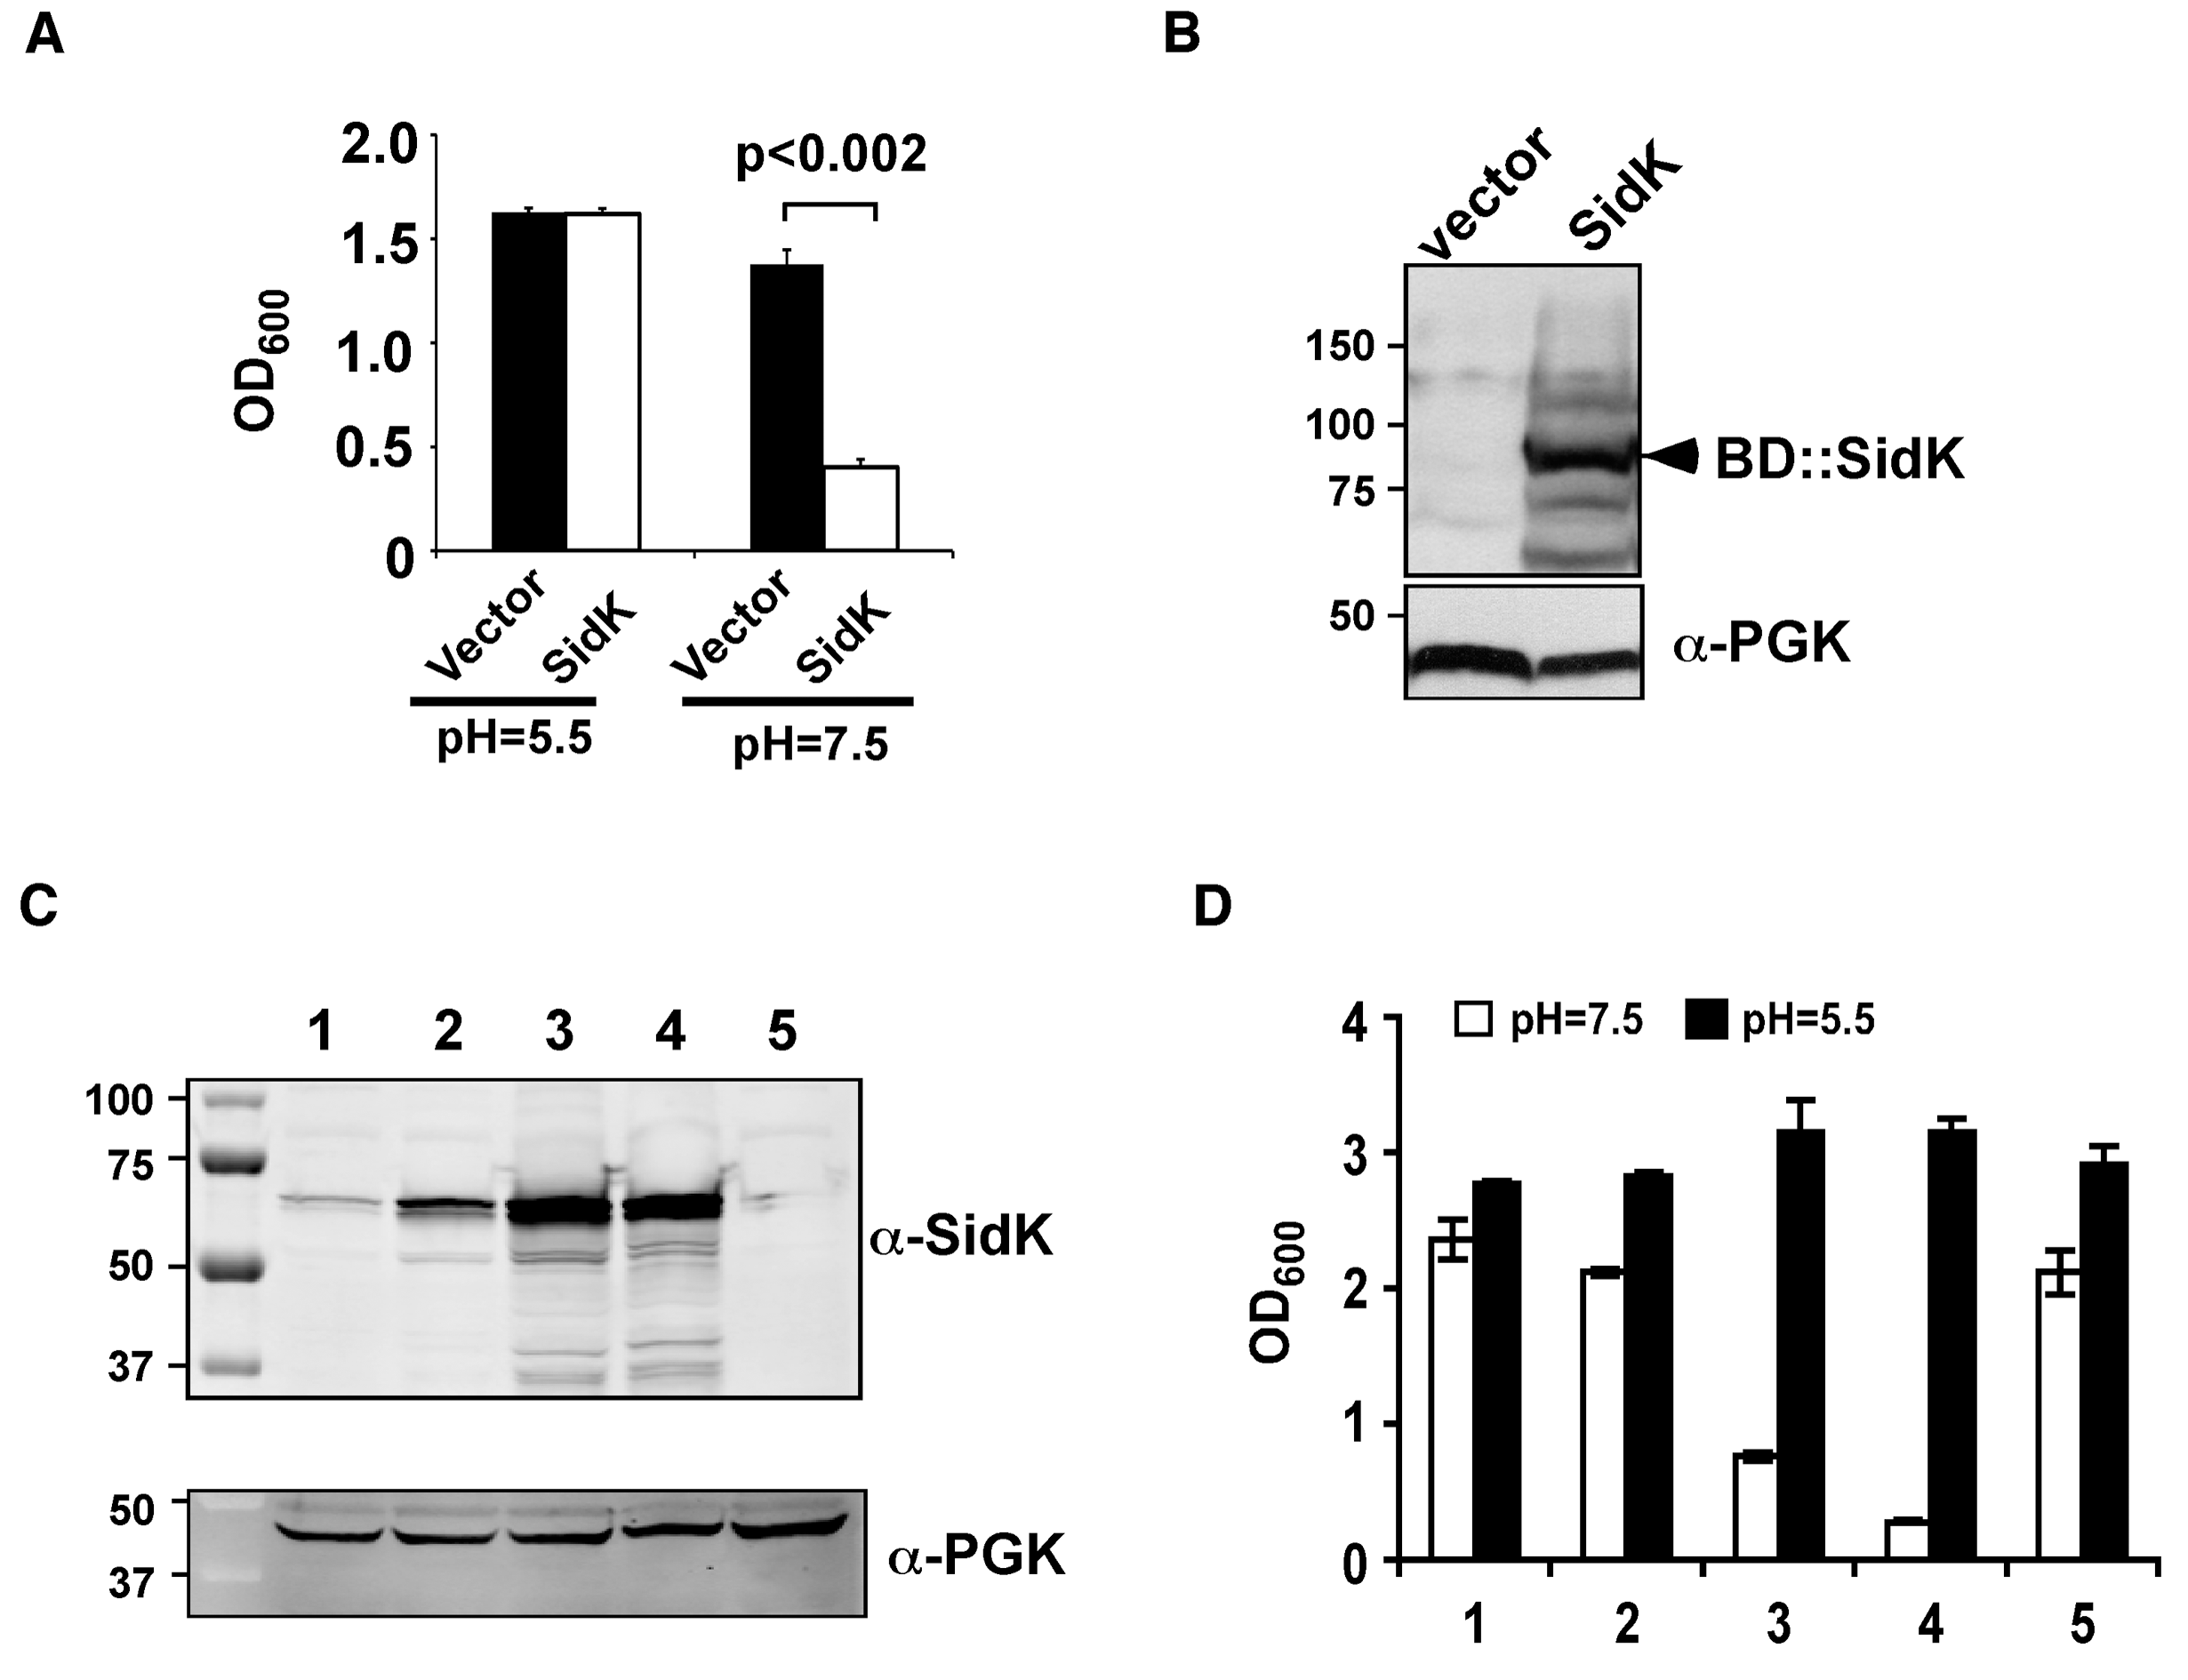 Identification of <i>L. pneumophila</i> protein that inhibits yeast growth in neutral pH medium.